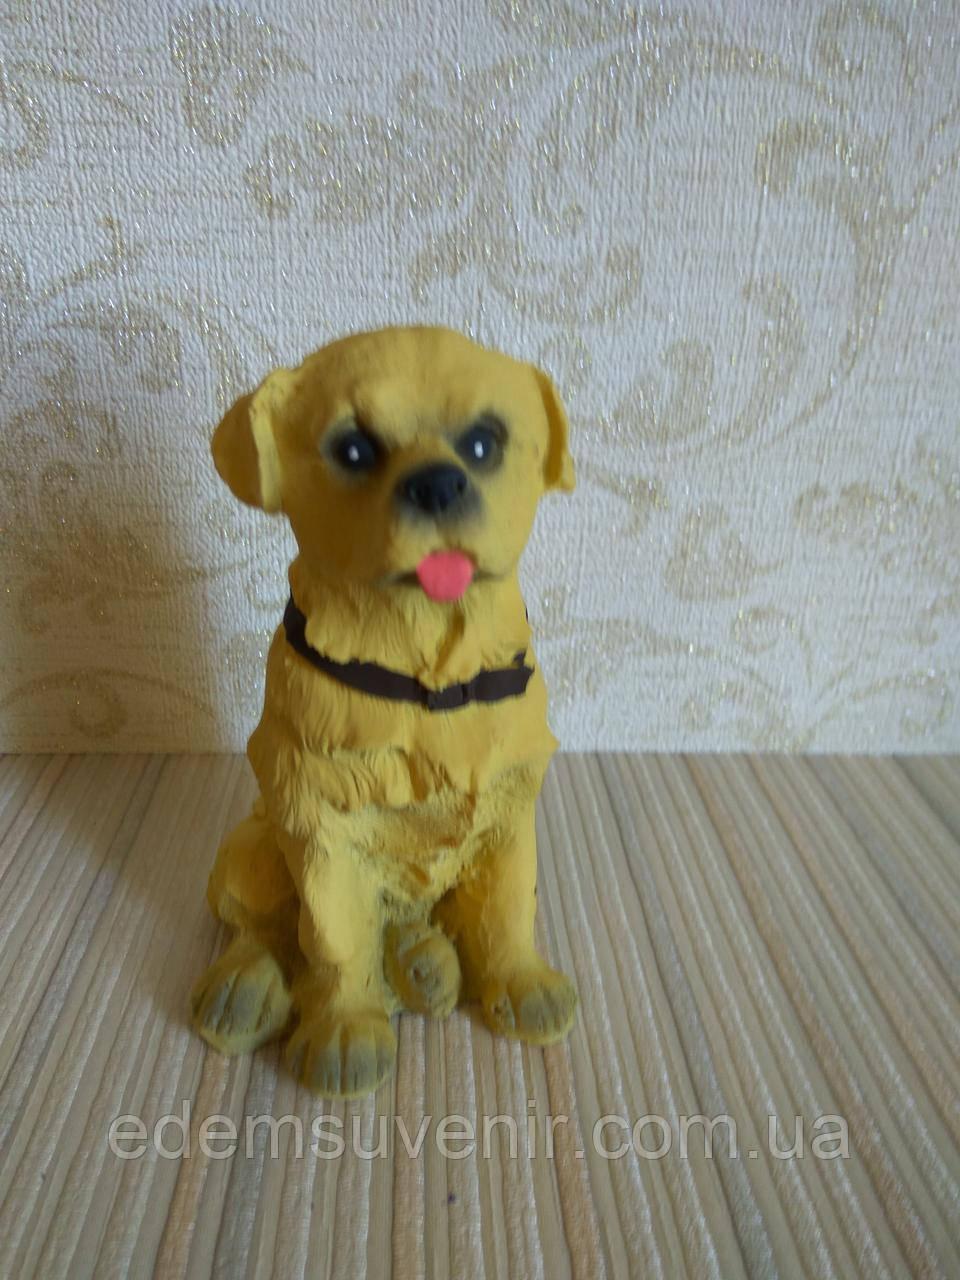 Статуэтка собачка лабрадор